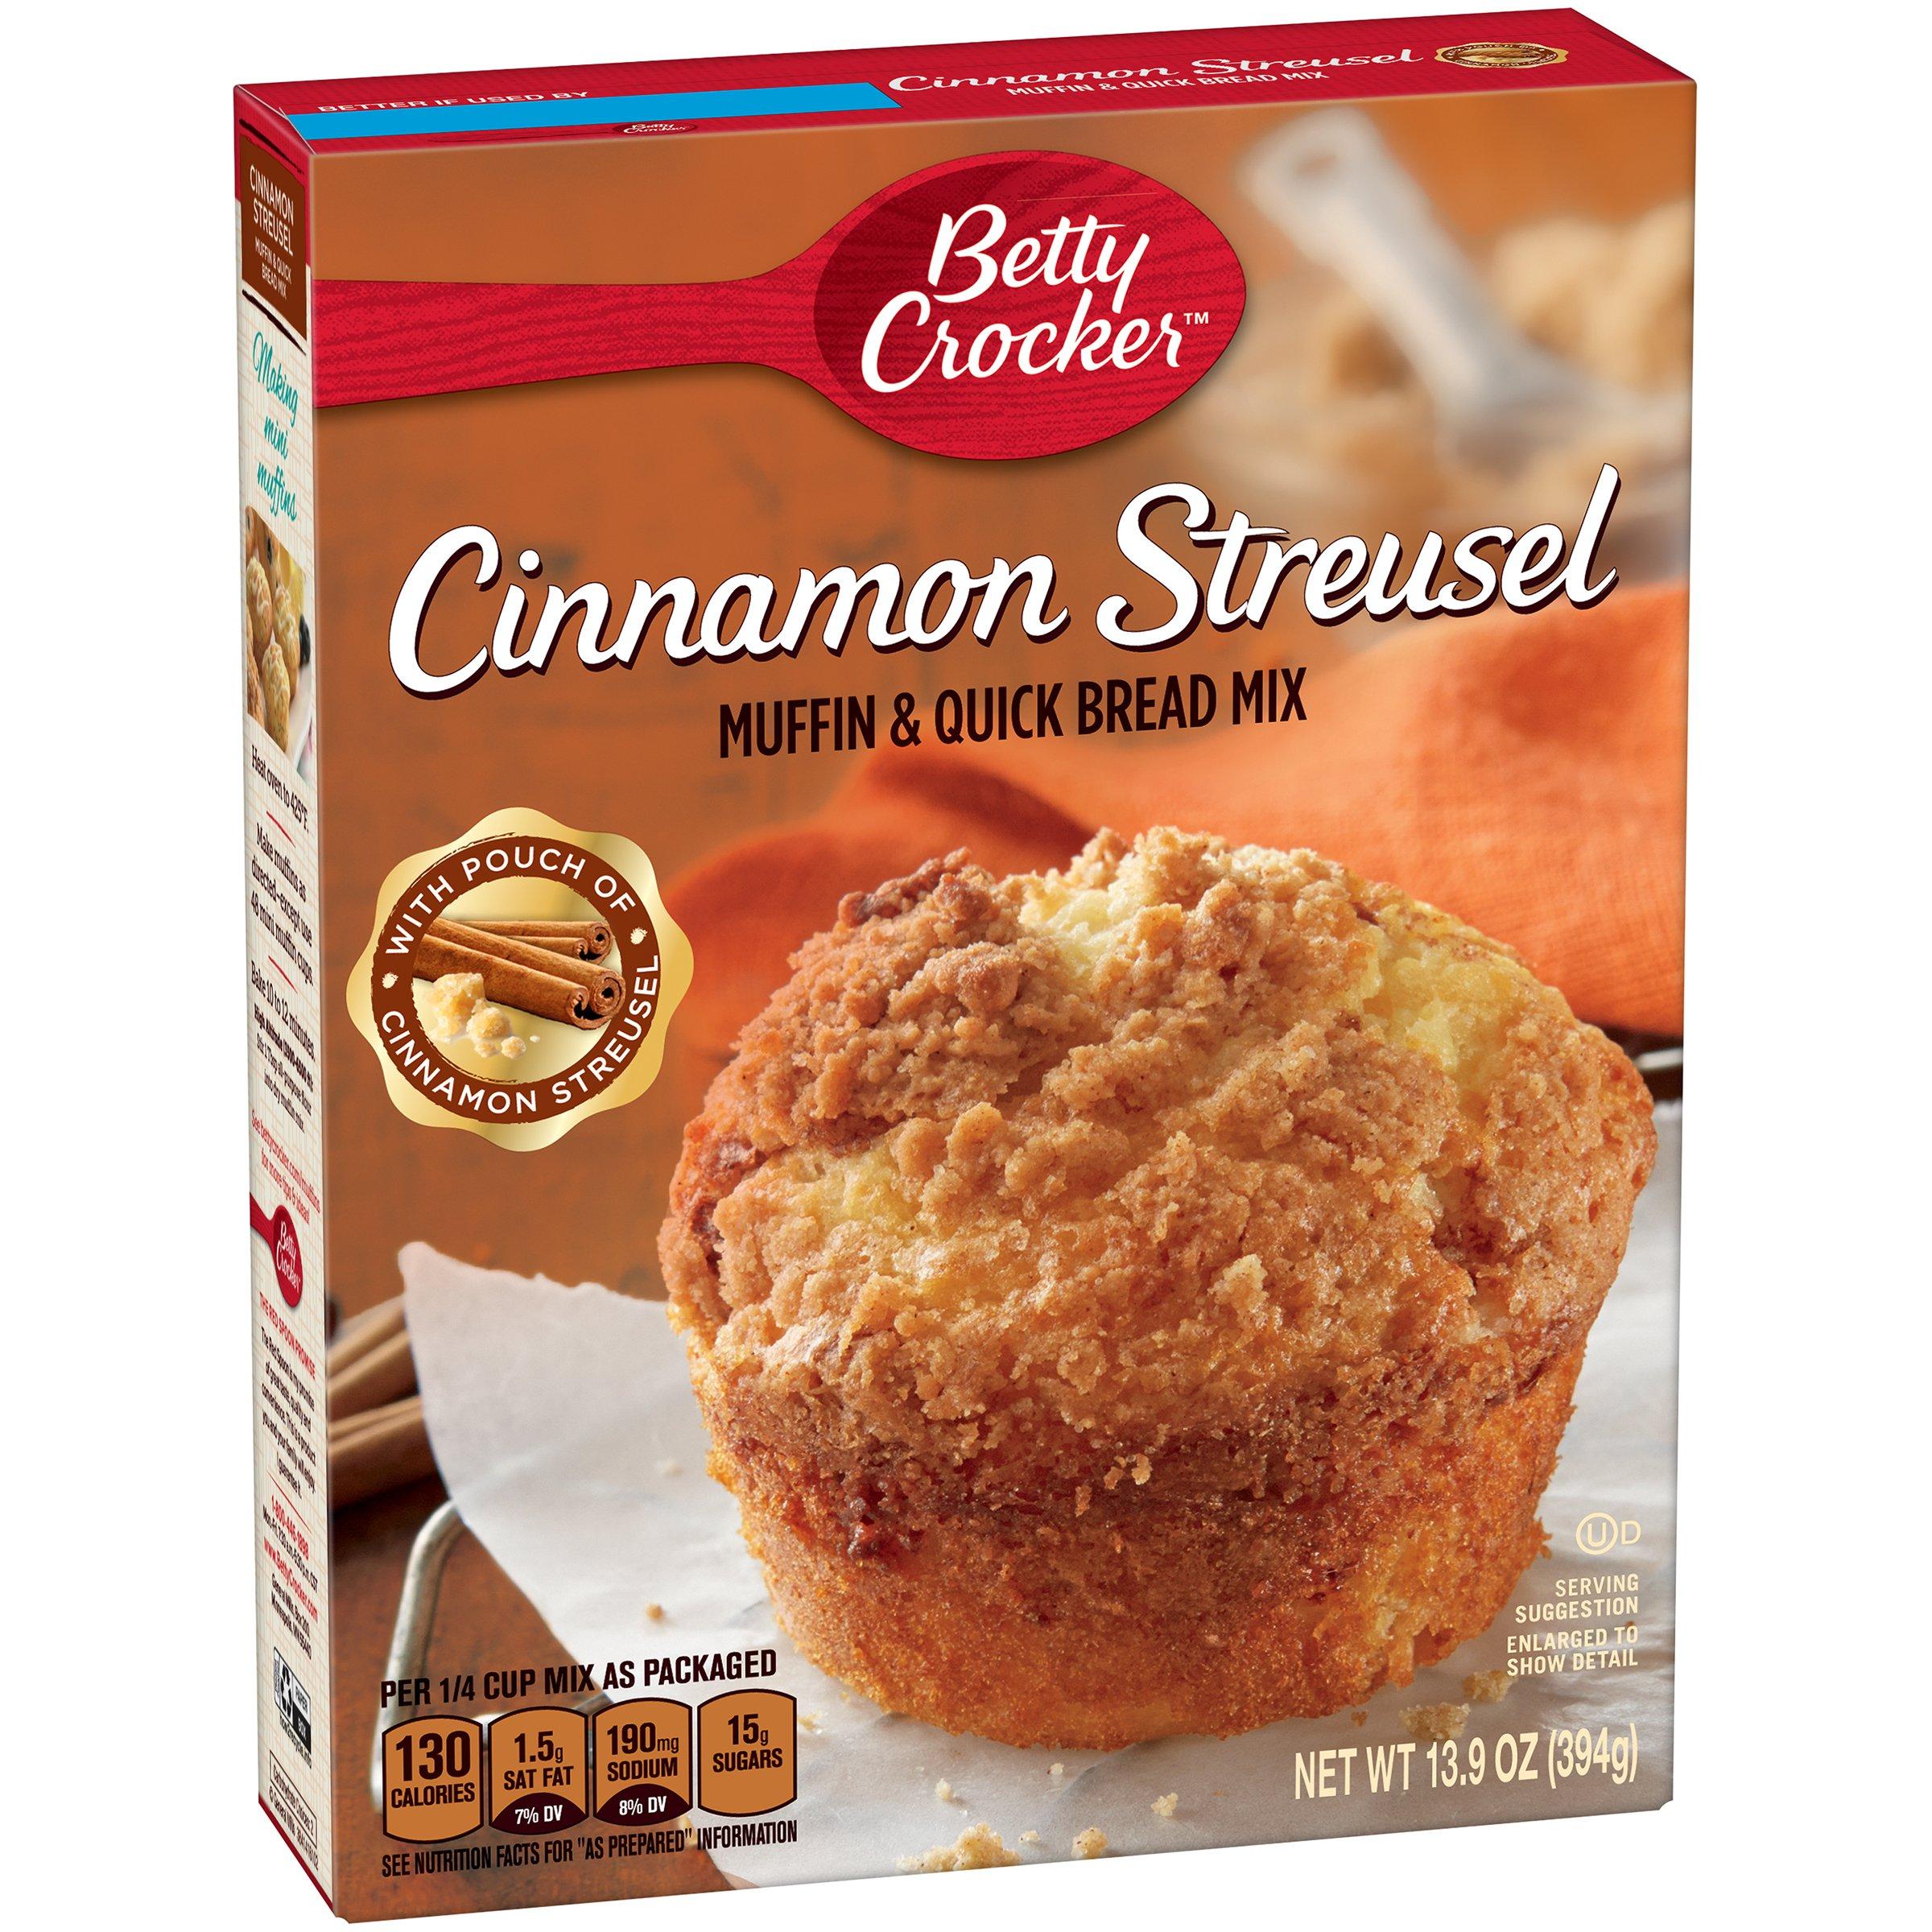 Betty Crocker Baking Mix, Muffin & Quick Bread Mix, Cinnamon Streusel, 13.9 Oz Box (Pack of 12)